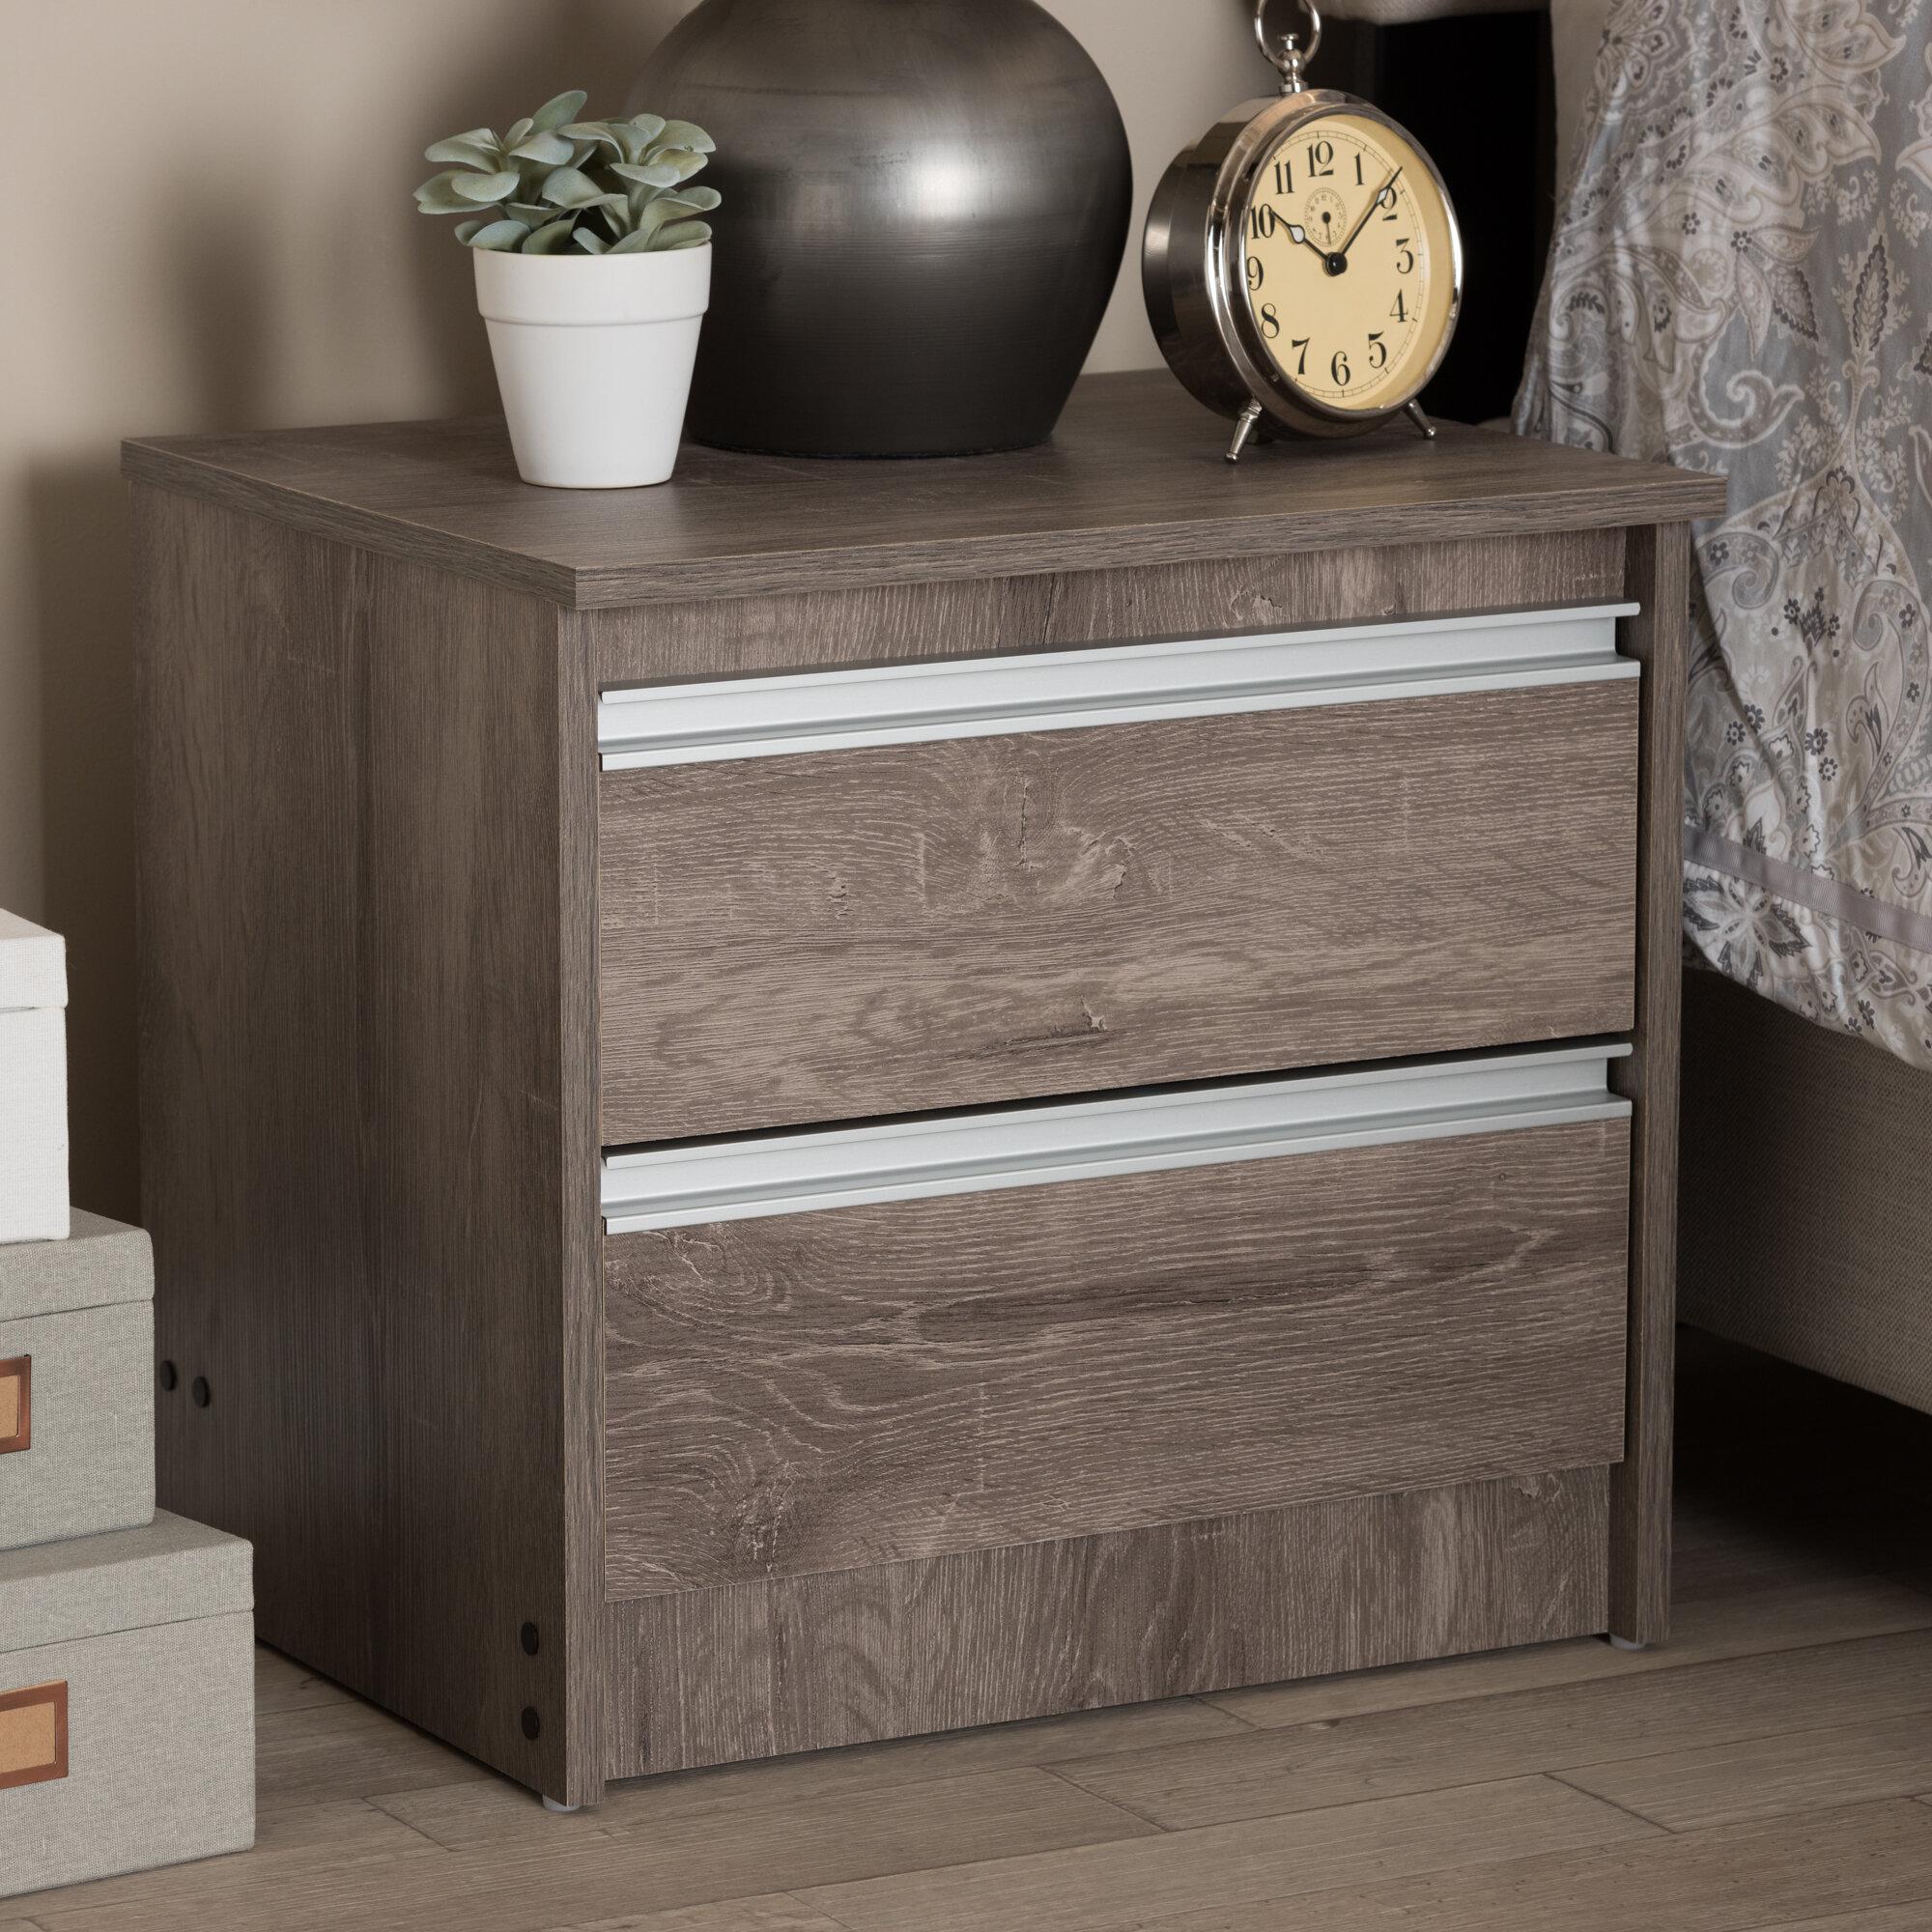 Rustic Industrial Wood Nightstand Beside Table w//Slatted Drawer /& Cubby Shelf